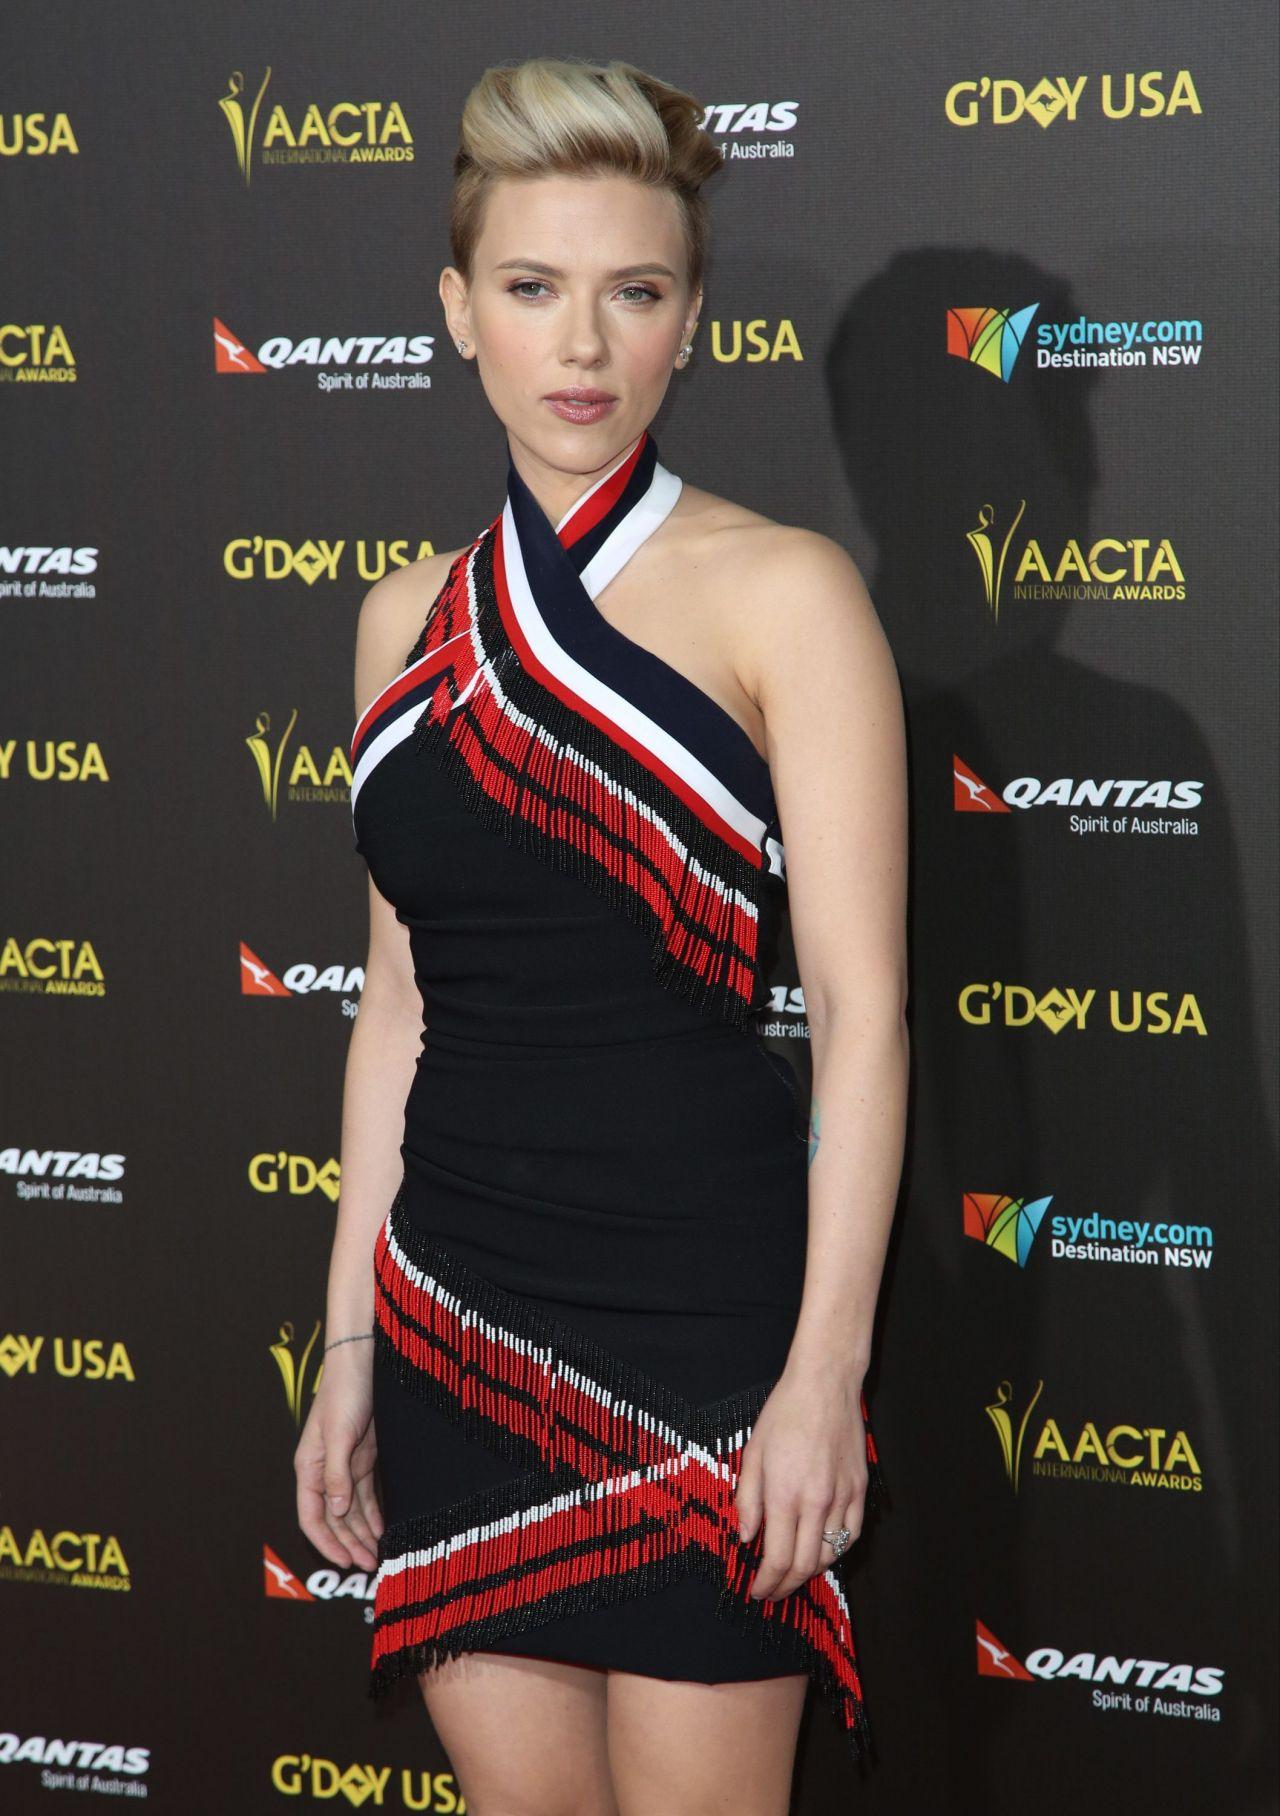 Скарлетт Йоханссон (Scarlett Johansson) в платье с бахромой